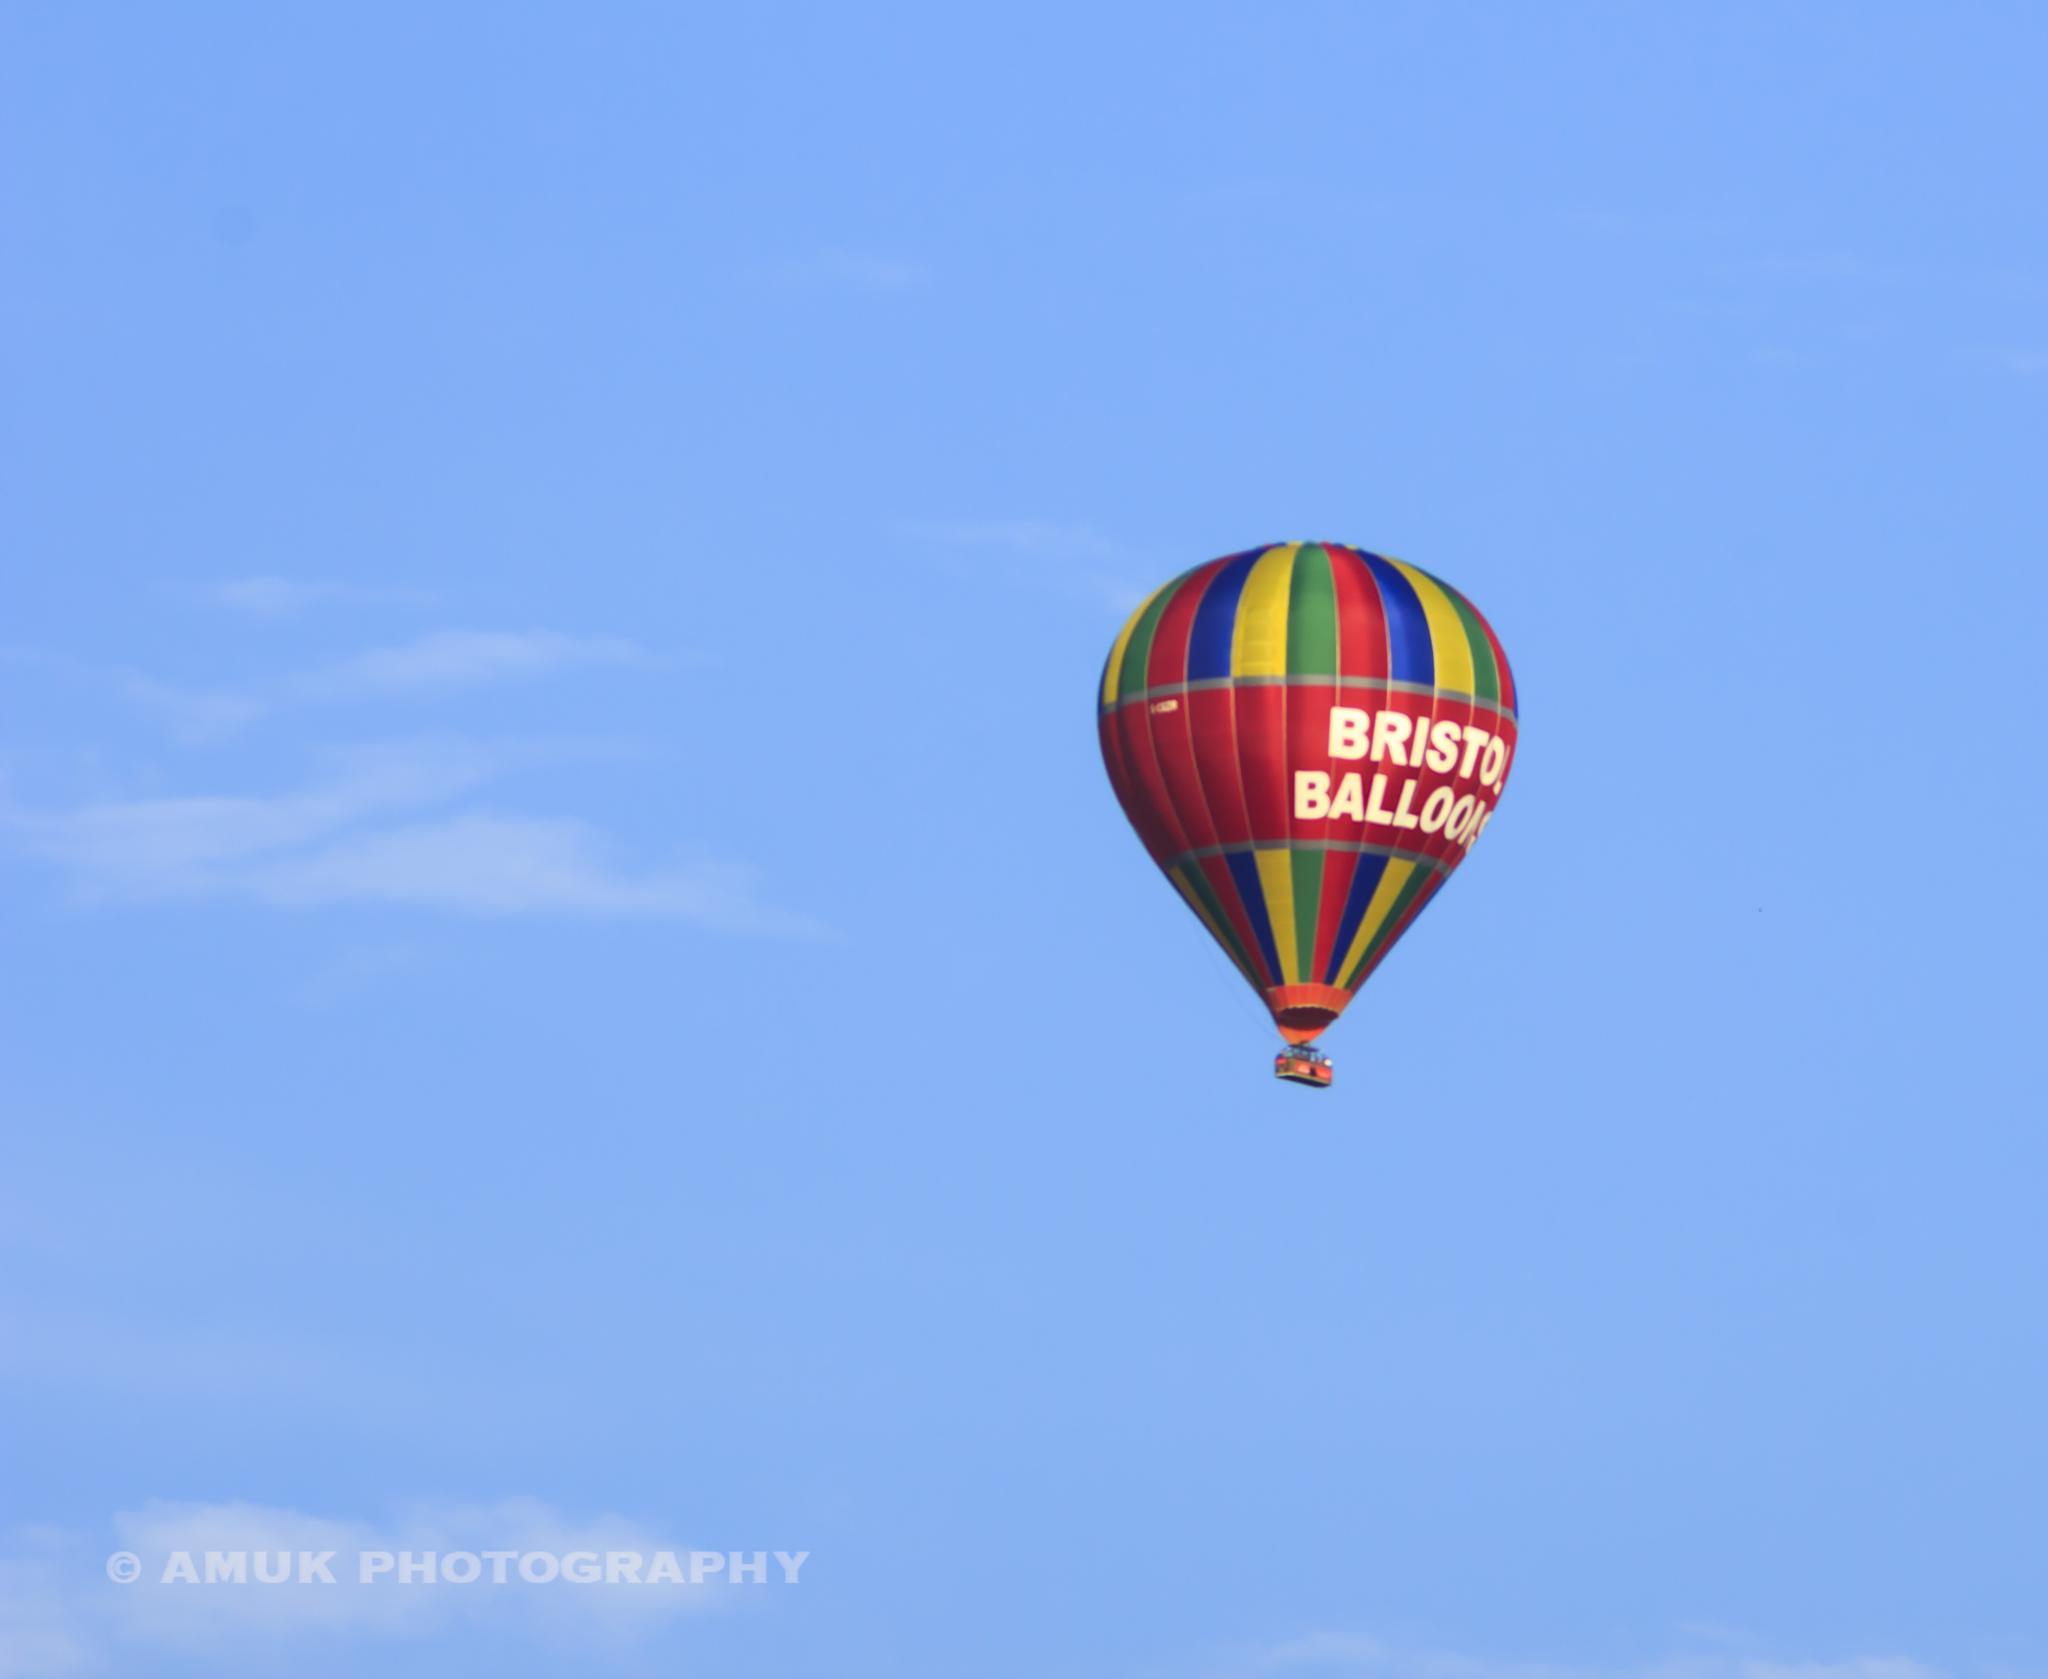 Bristol Balloons by AMUK PHOTOGRAPHY